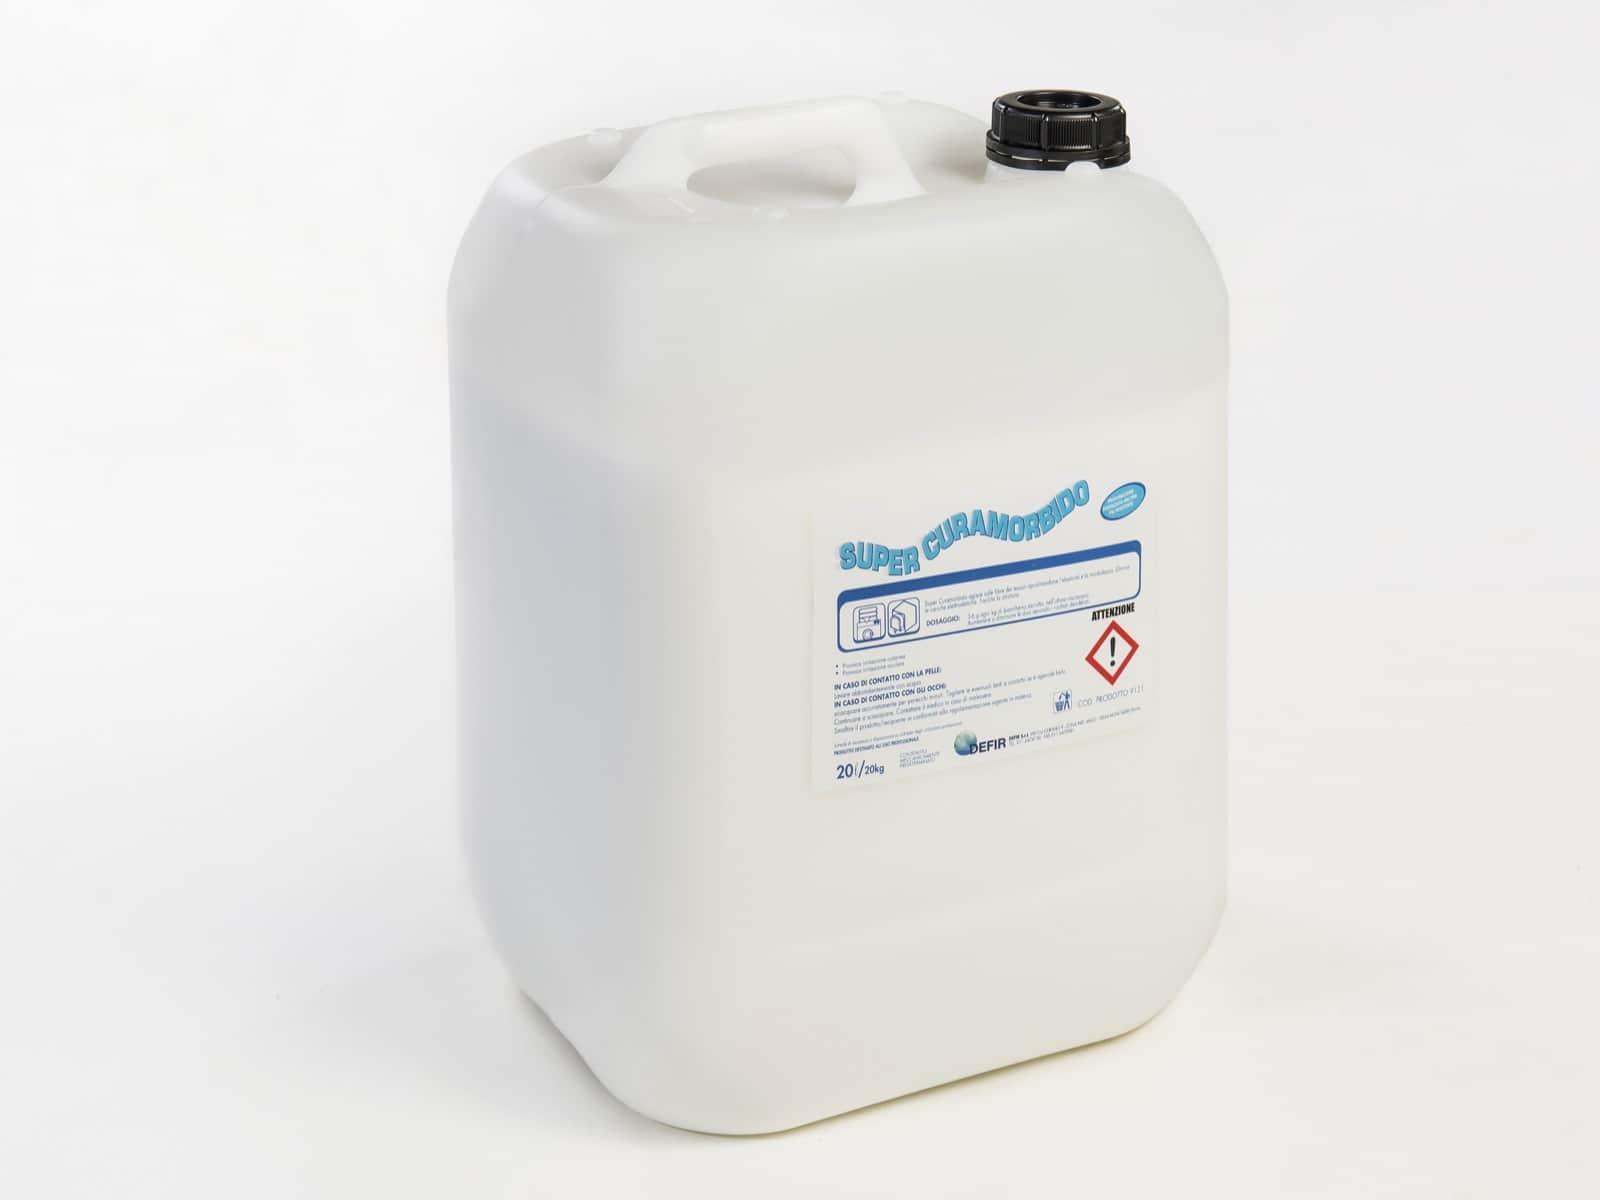 Super Curamorbido lavatrice ammorbidente 20l - Defir detergenti Moncalieri Torino